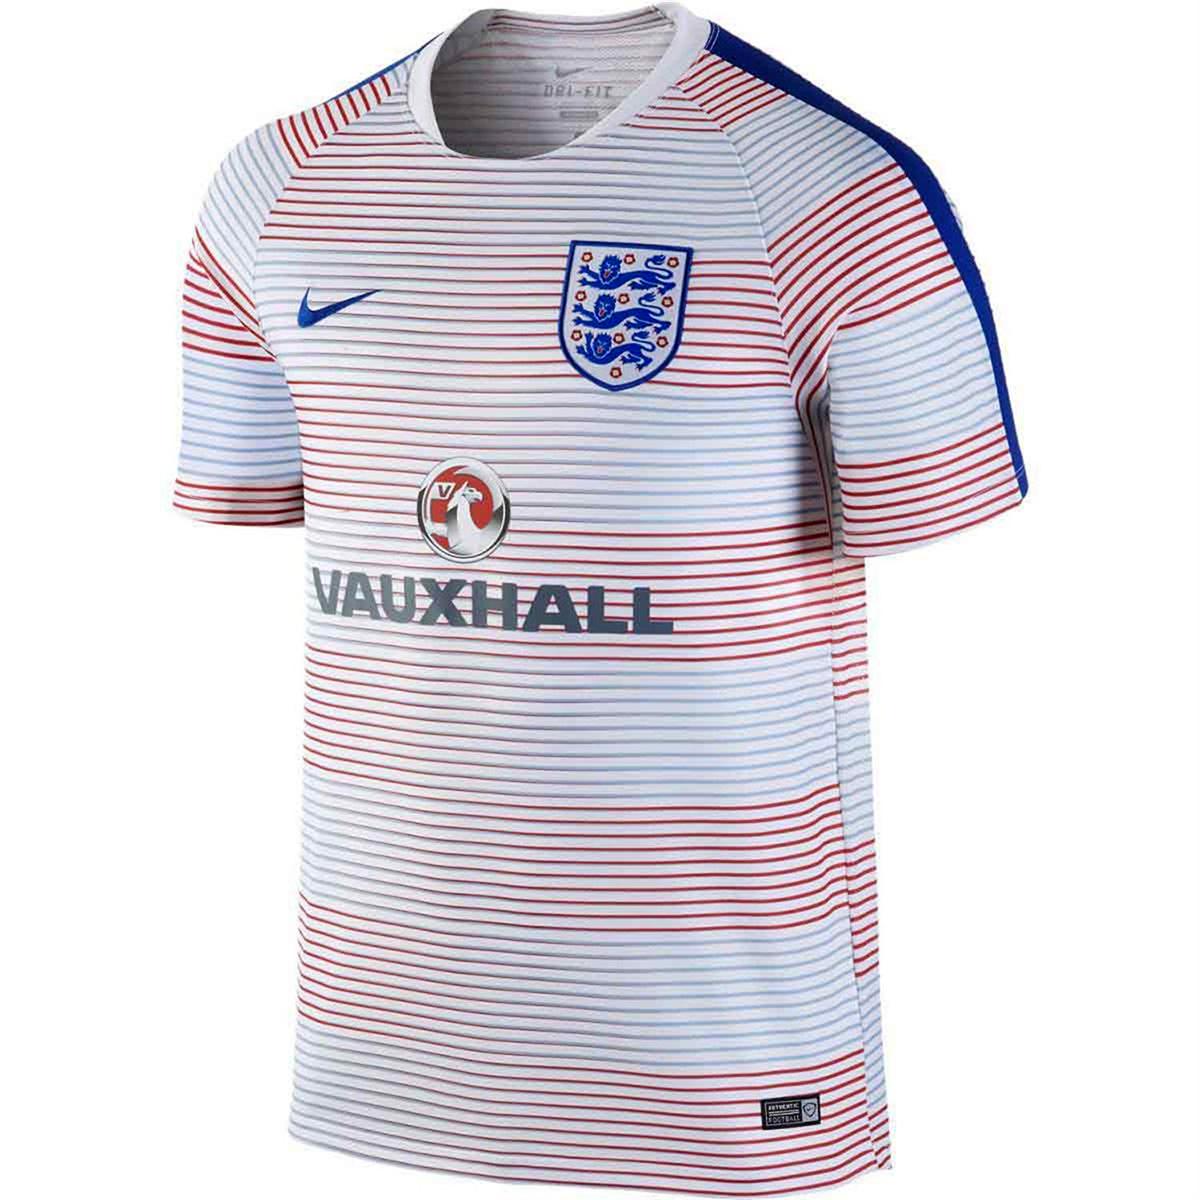 672e6e17f Nike England Flash Pre-Match SS 2 Tee - Soccer Shop WORLD CUP 2018  MERCHANDISE - Superfanas.lt